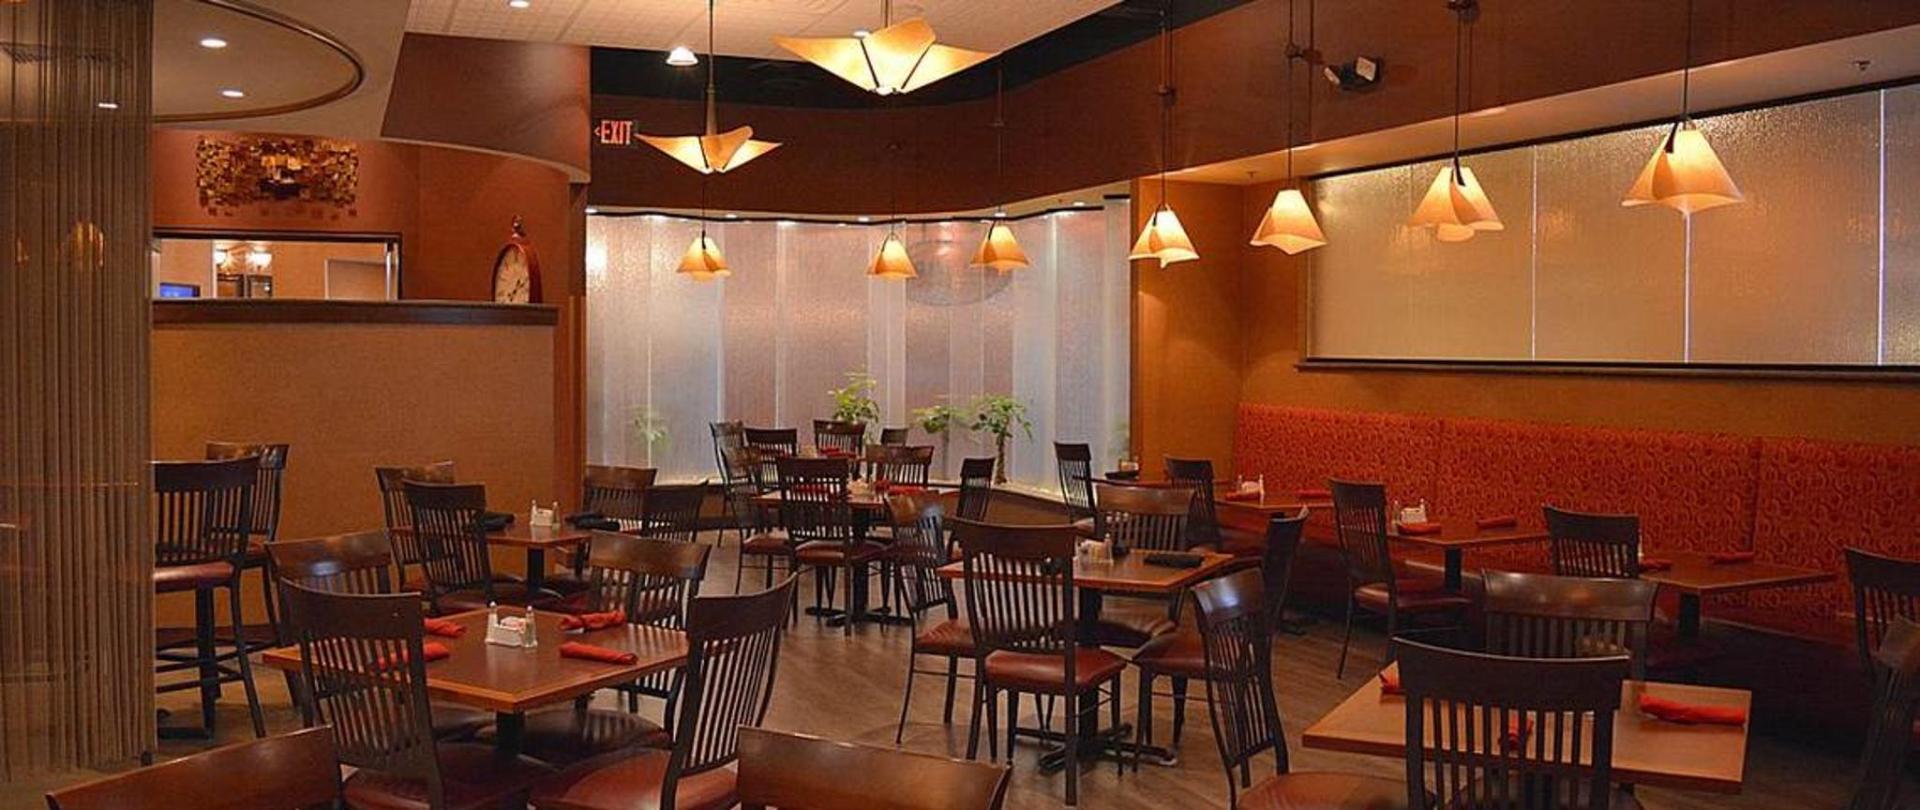 restaurant-horizontal-sm.jpg.1140x481_default.jpg